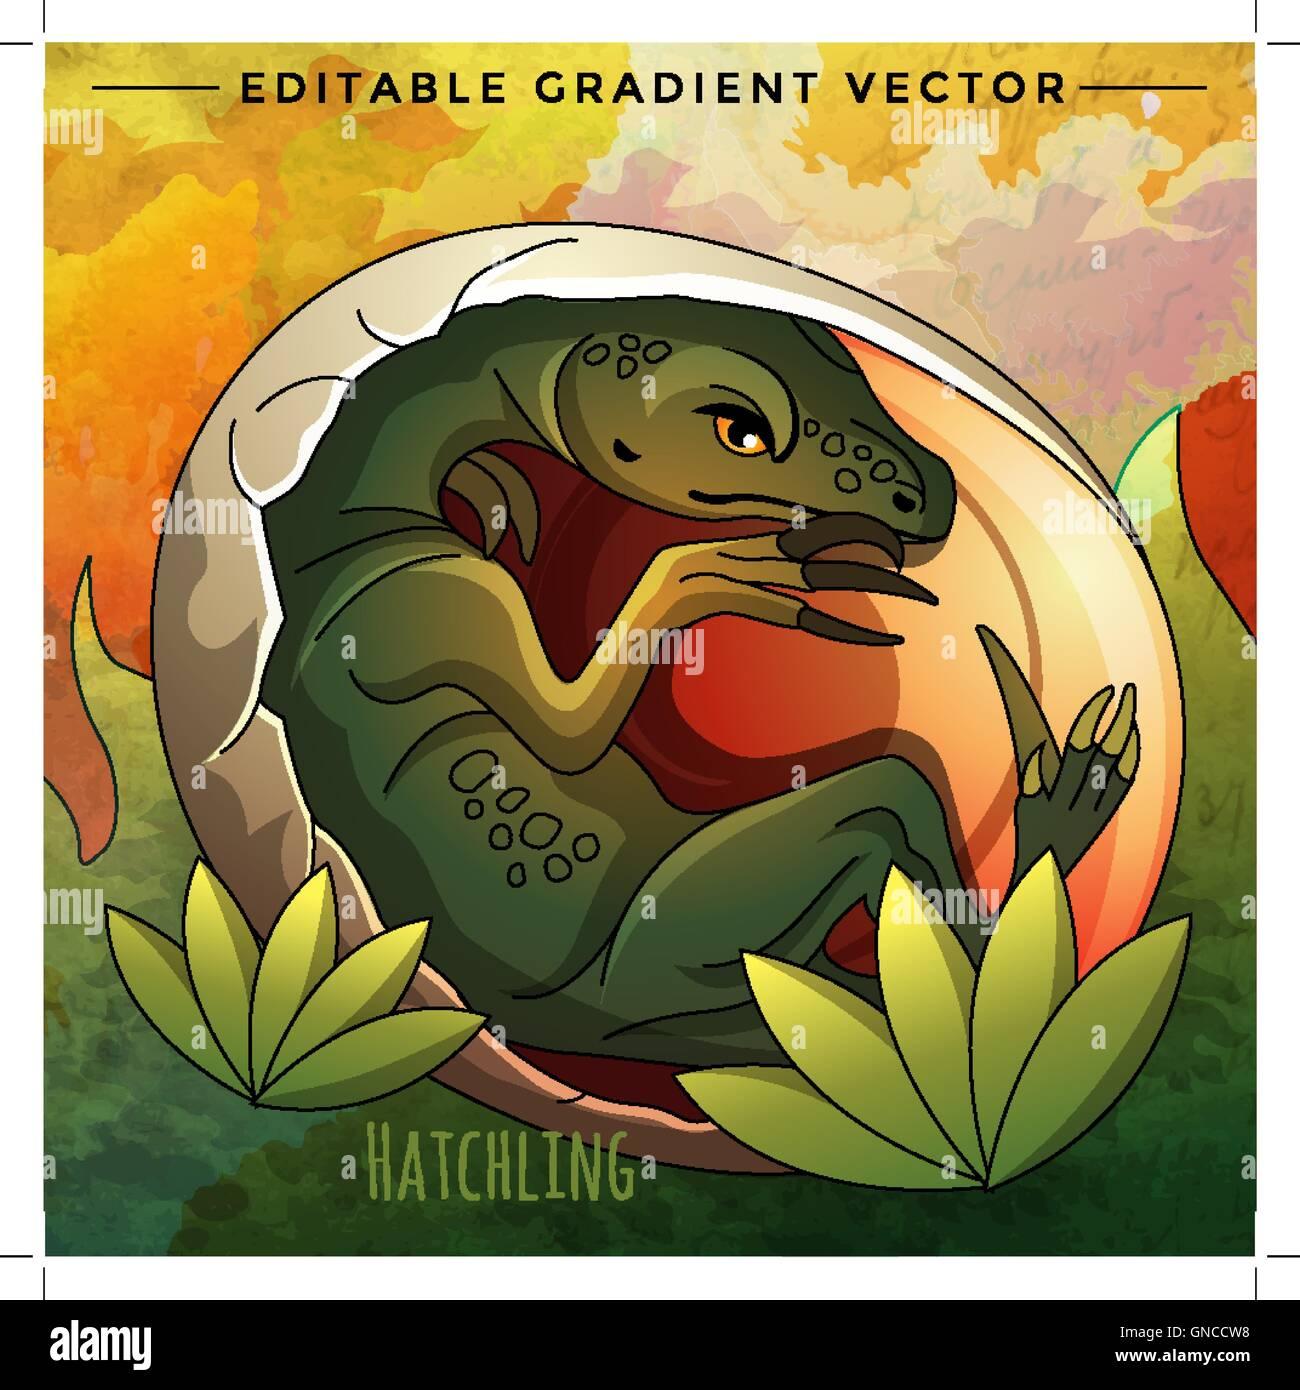 Hatching Dinosaur Egg. Vector Illustration - Stock Image